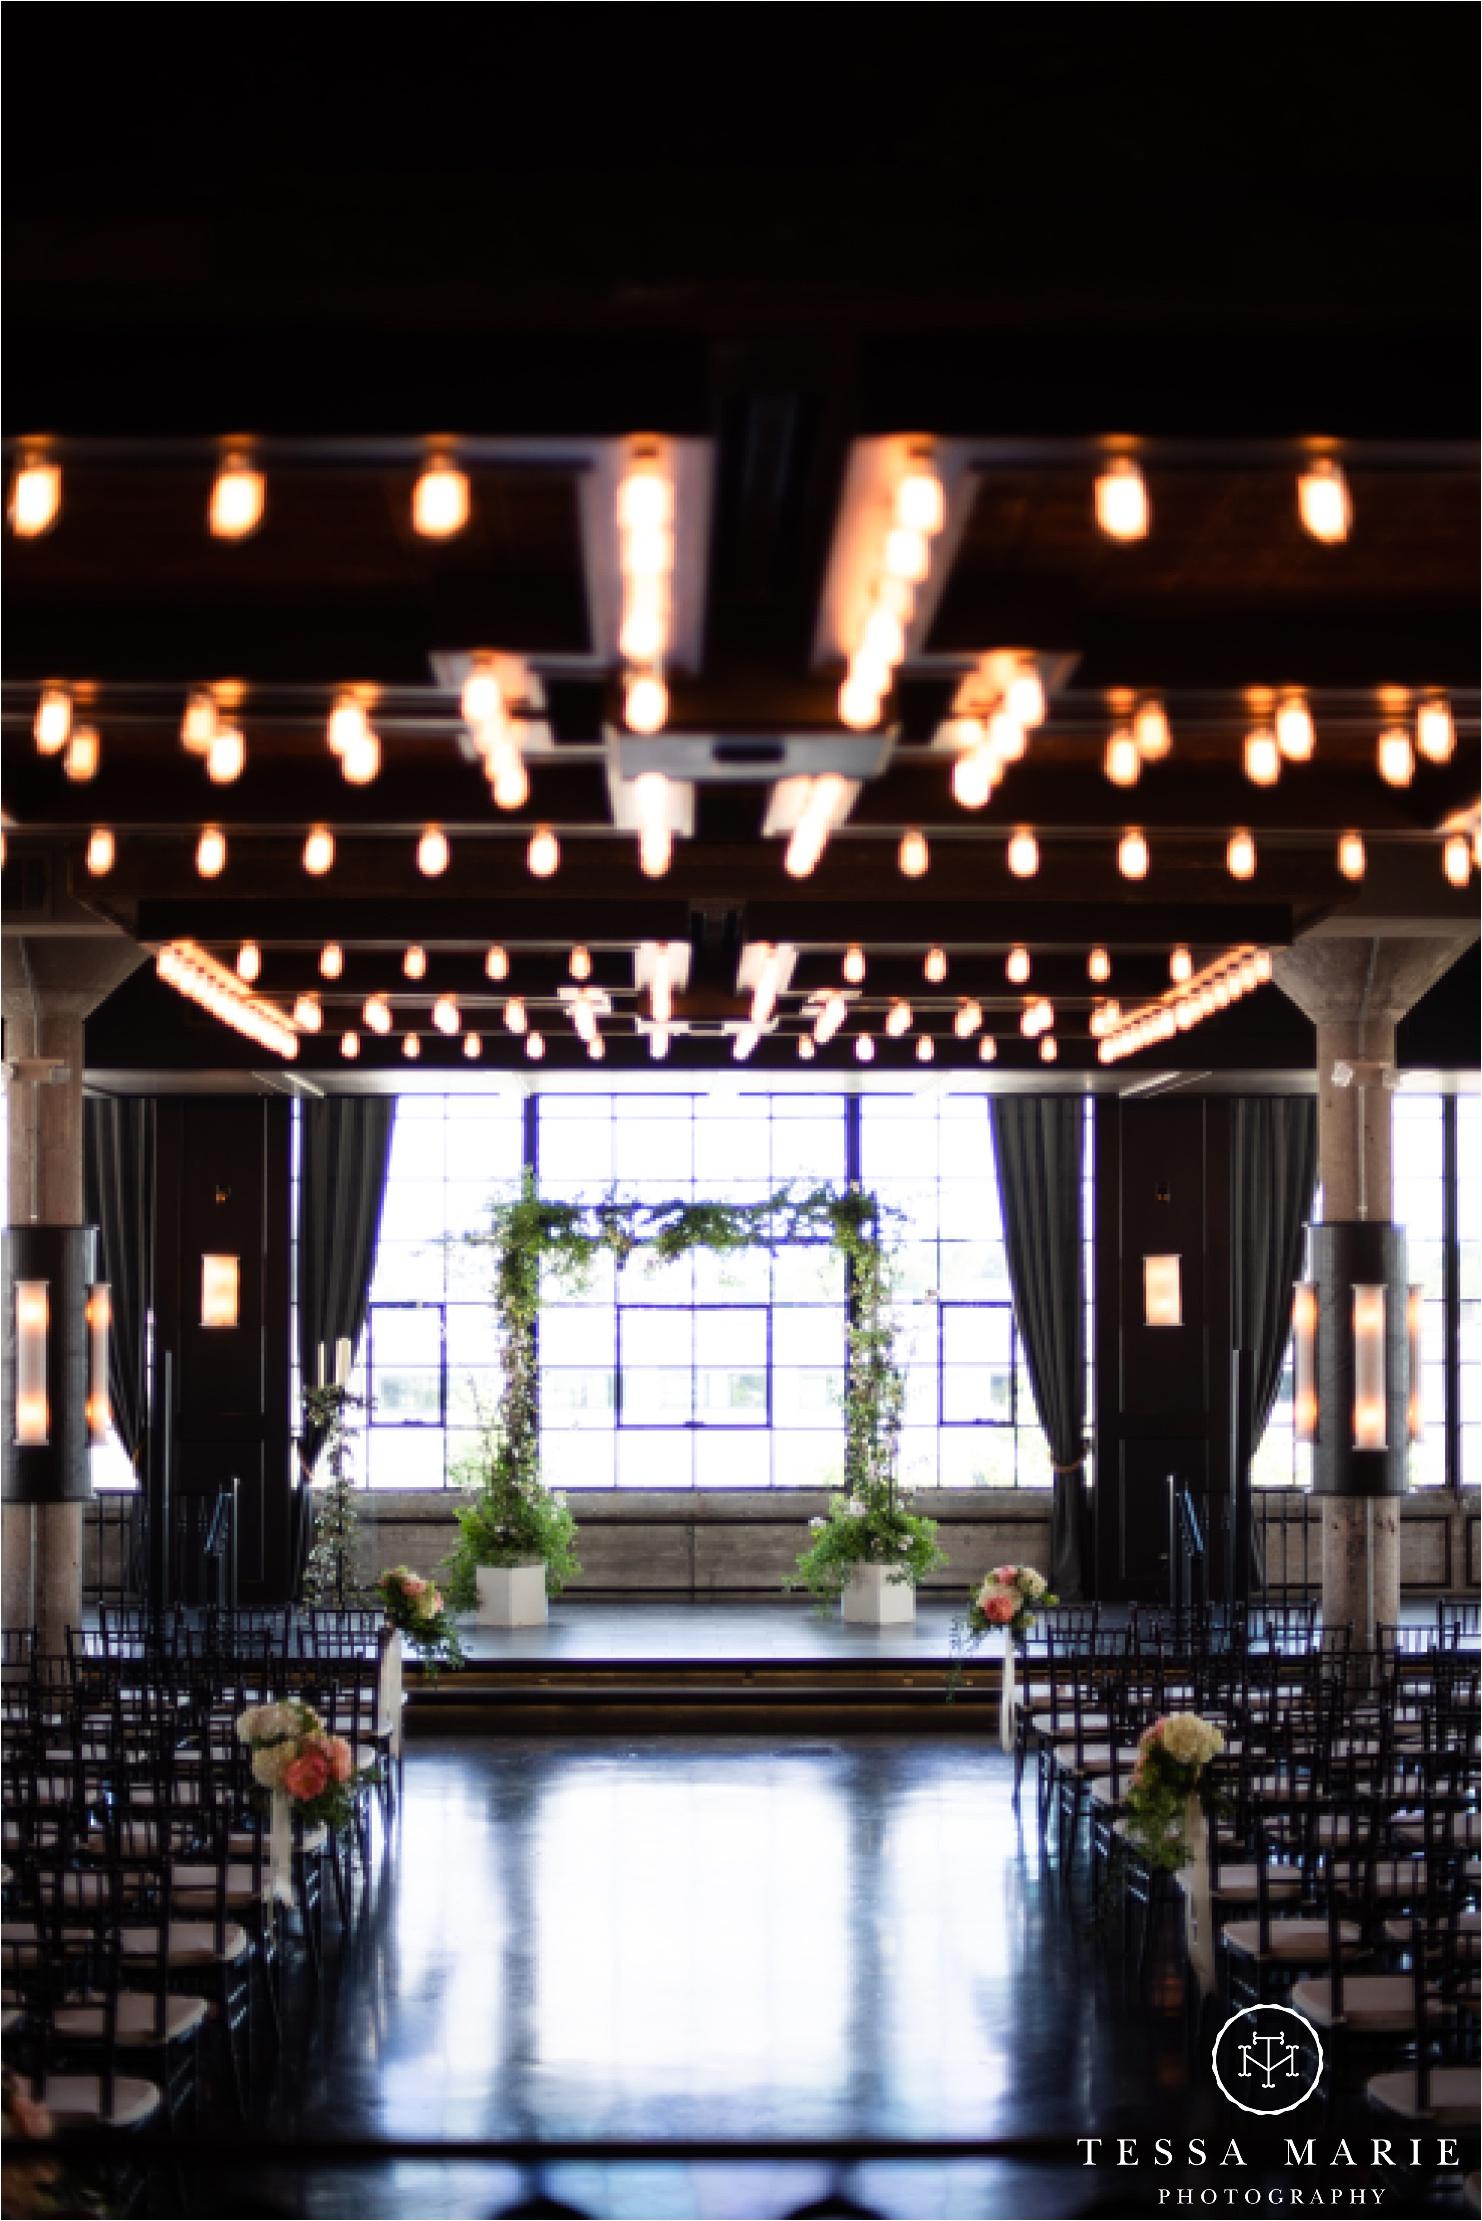 Tessa_marie_weddings_houston_wedding_photographer_The_astorian_0104.jpg